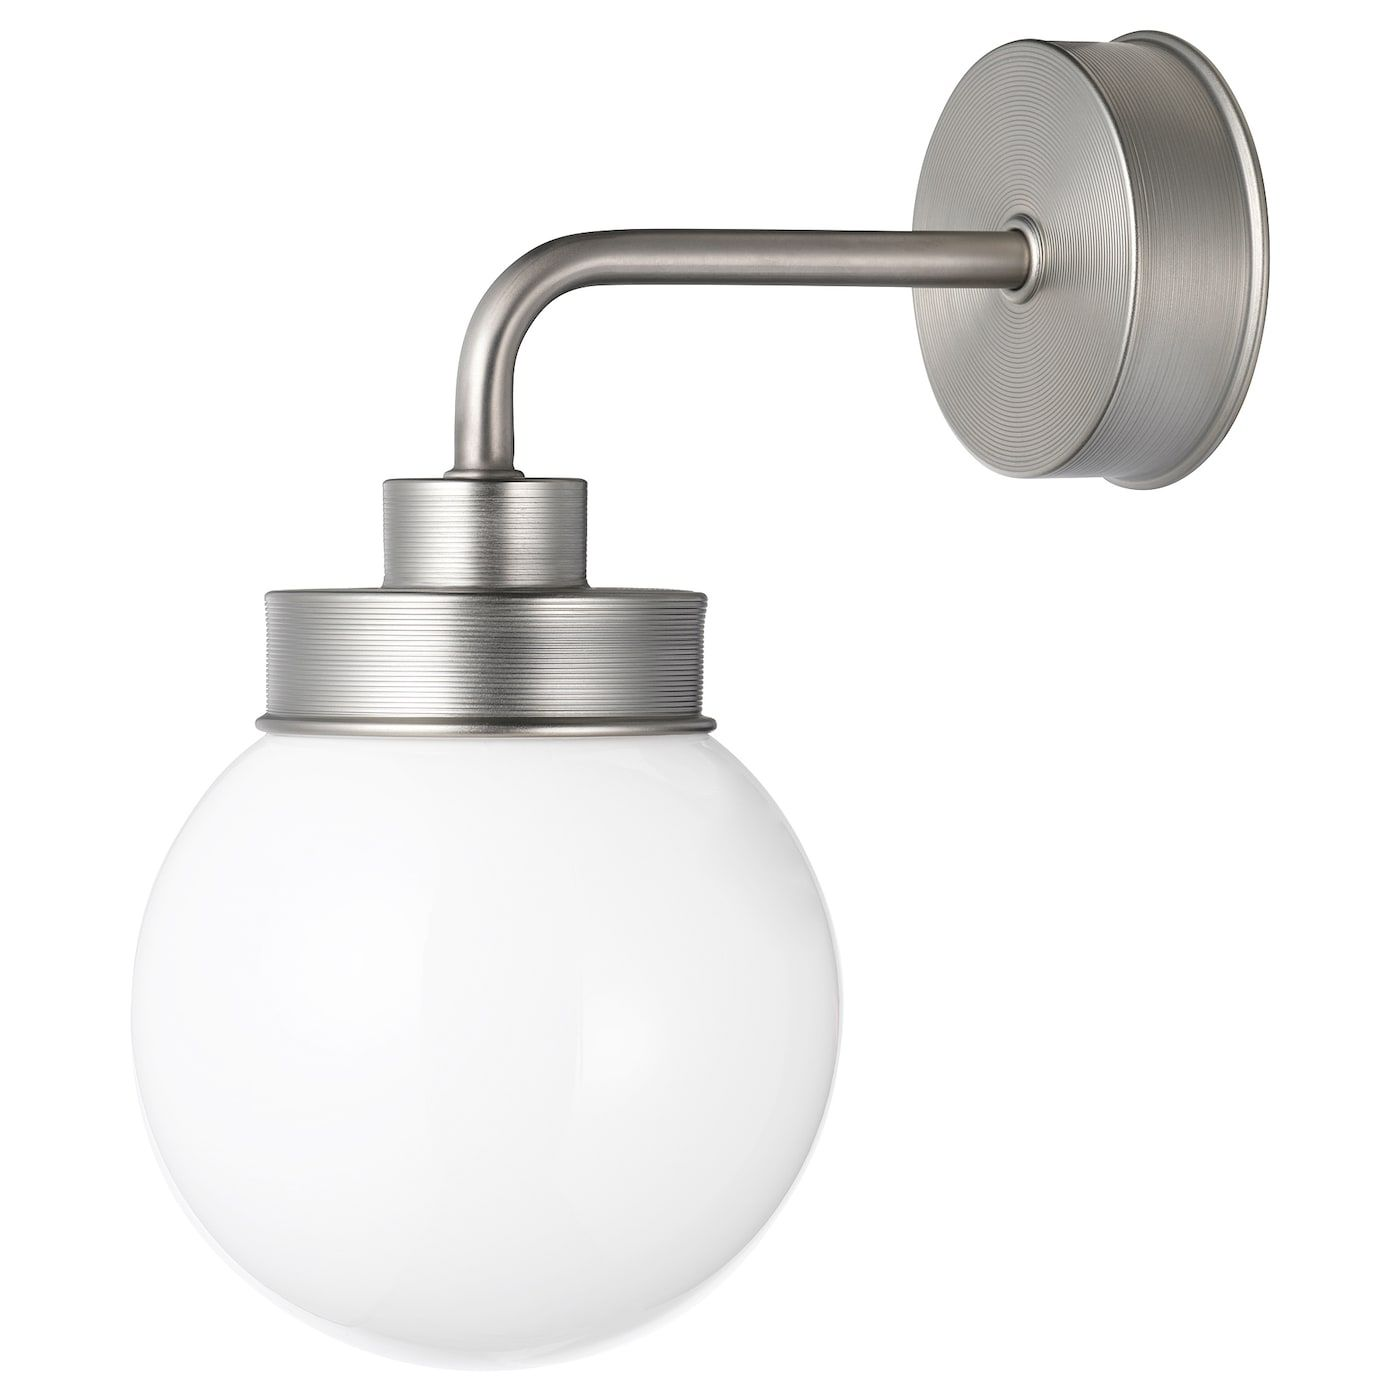 Frihult Wandleuchte Stahlfarben Ikea Deutschland Wall Lamp Lamp Traditional Style Lamps